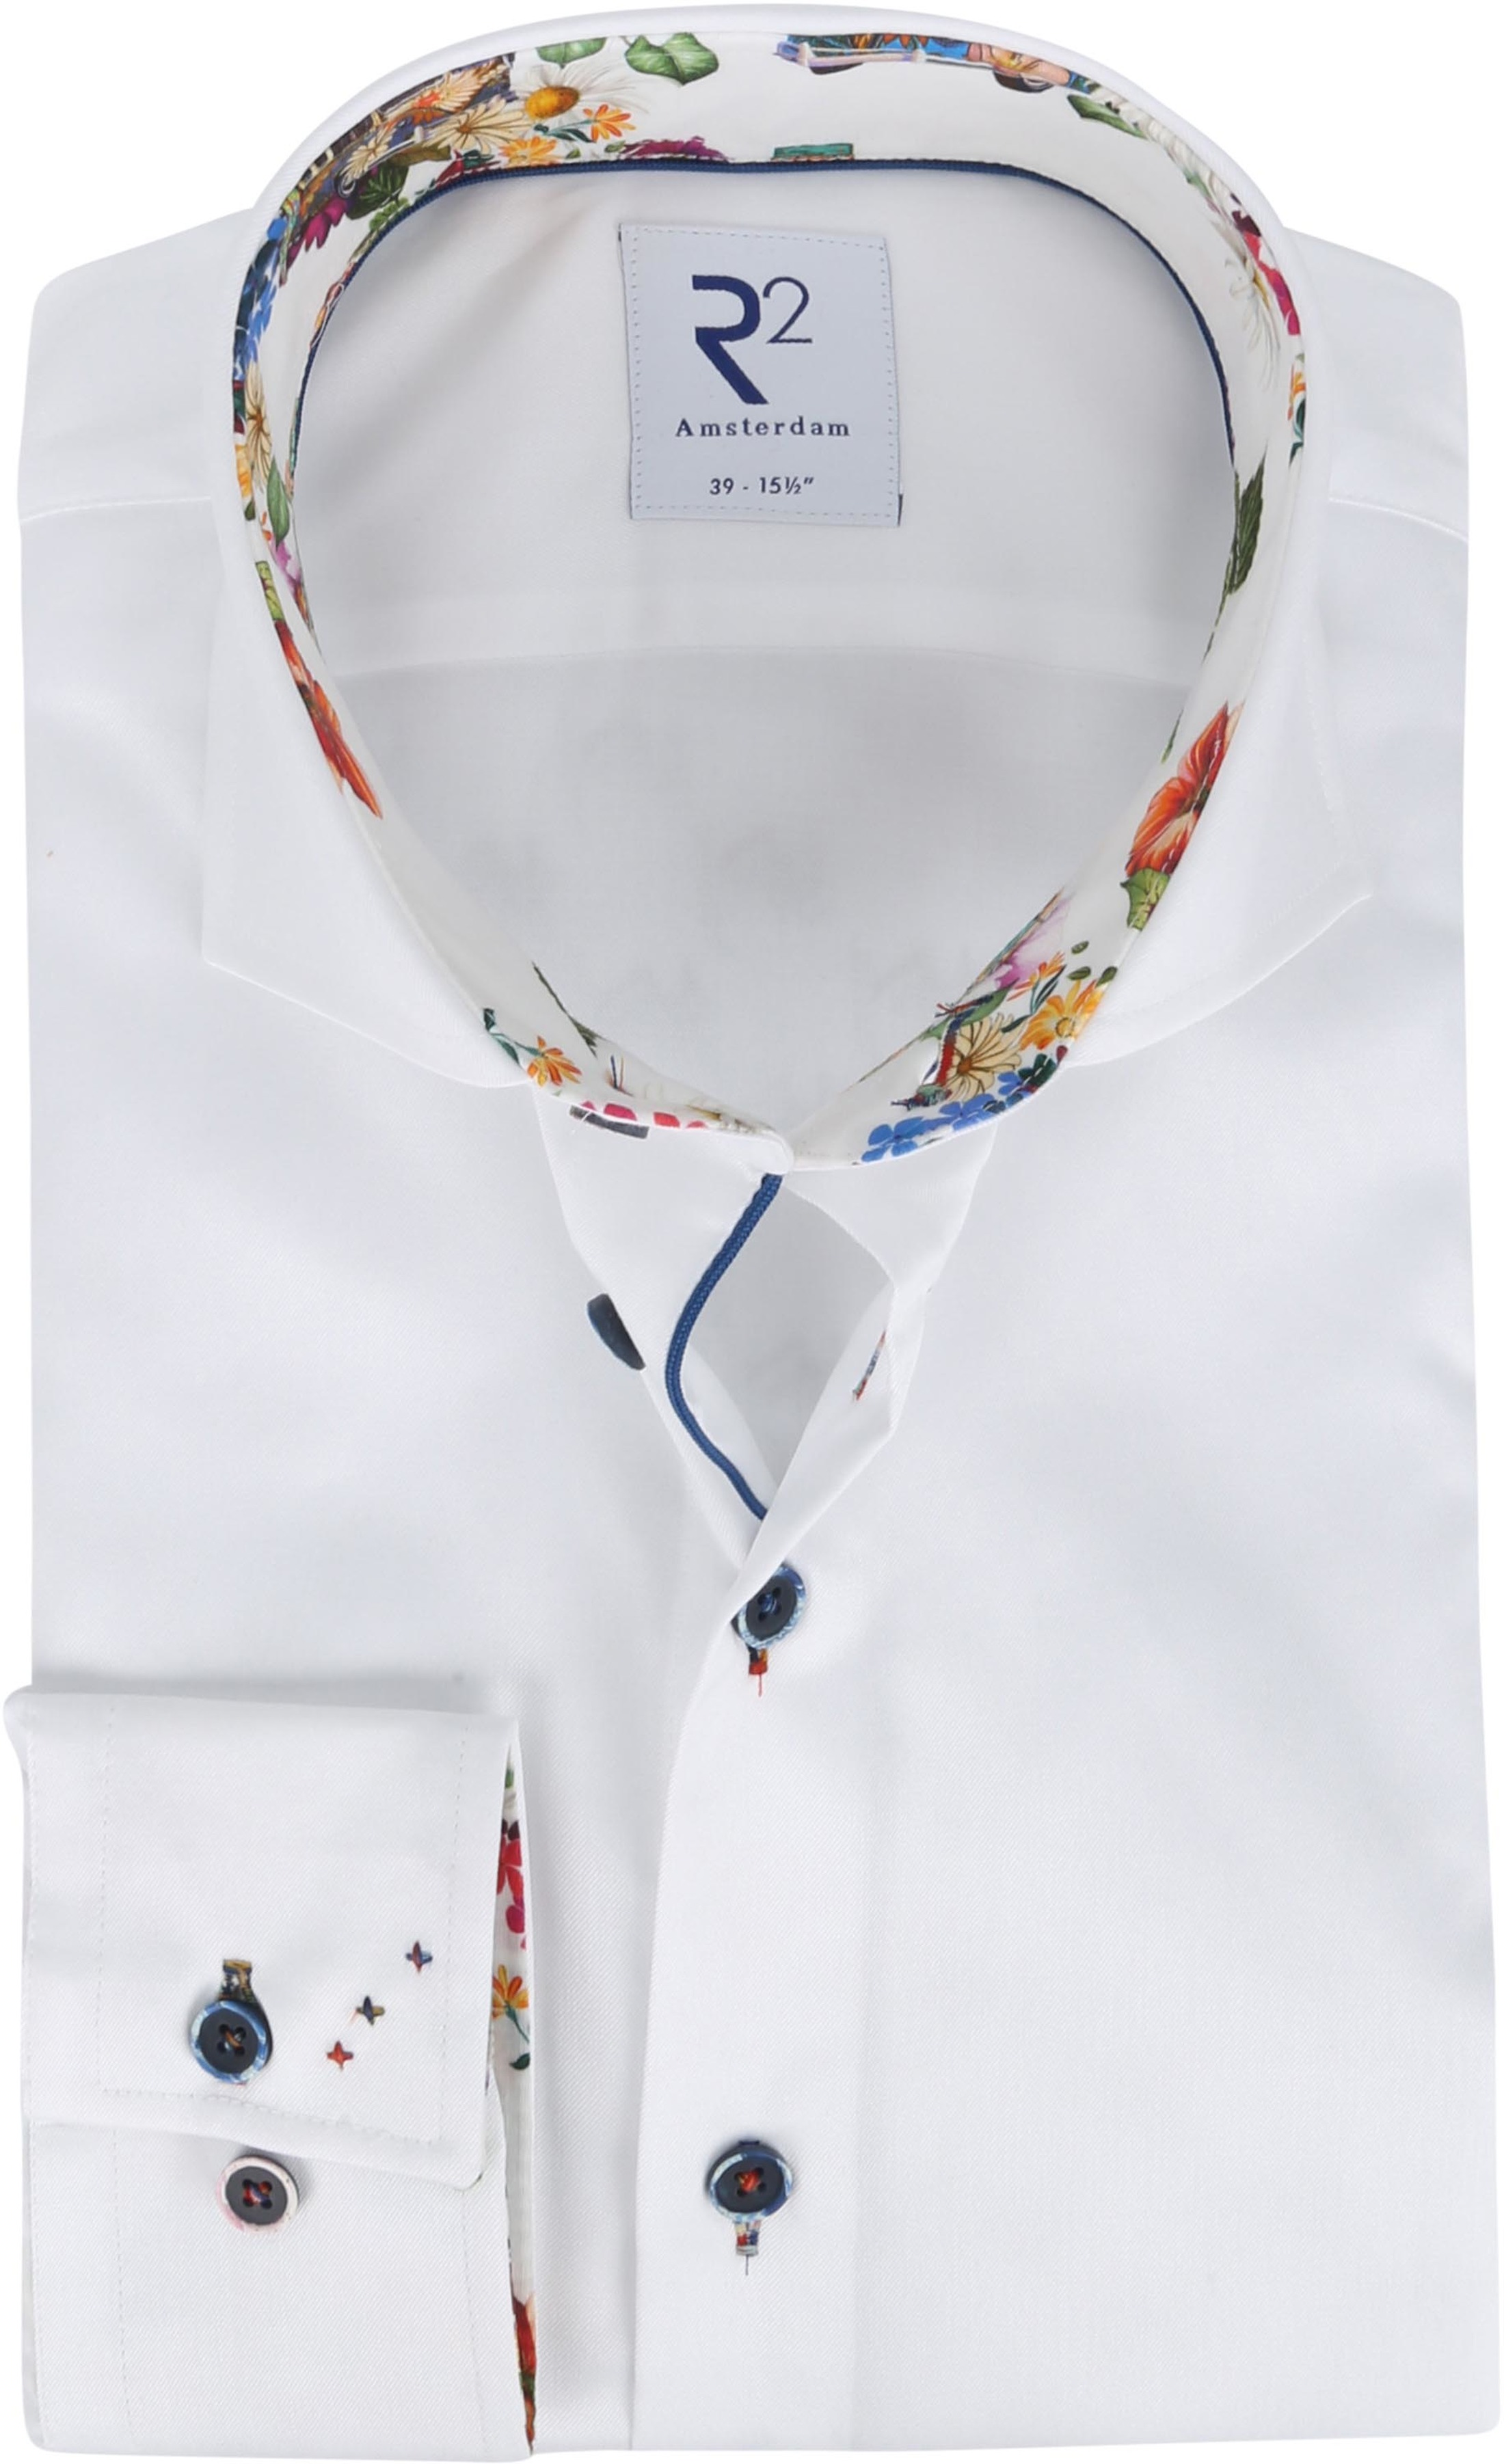 R2 Shirt White Flowers Multicolour